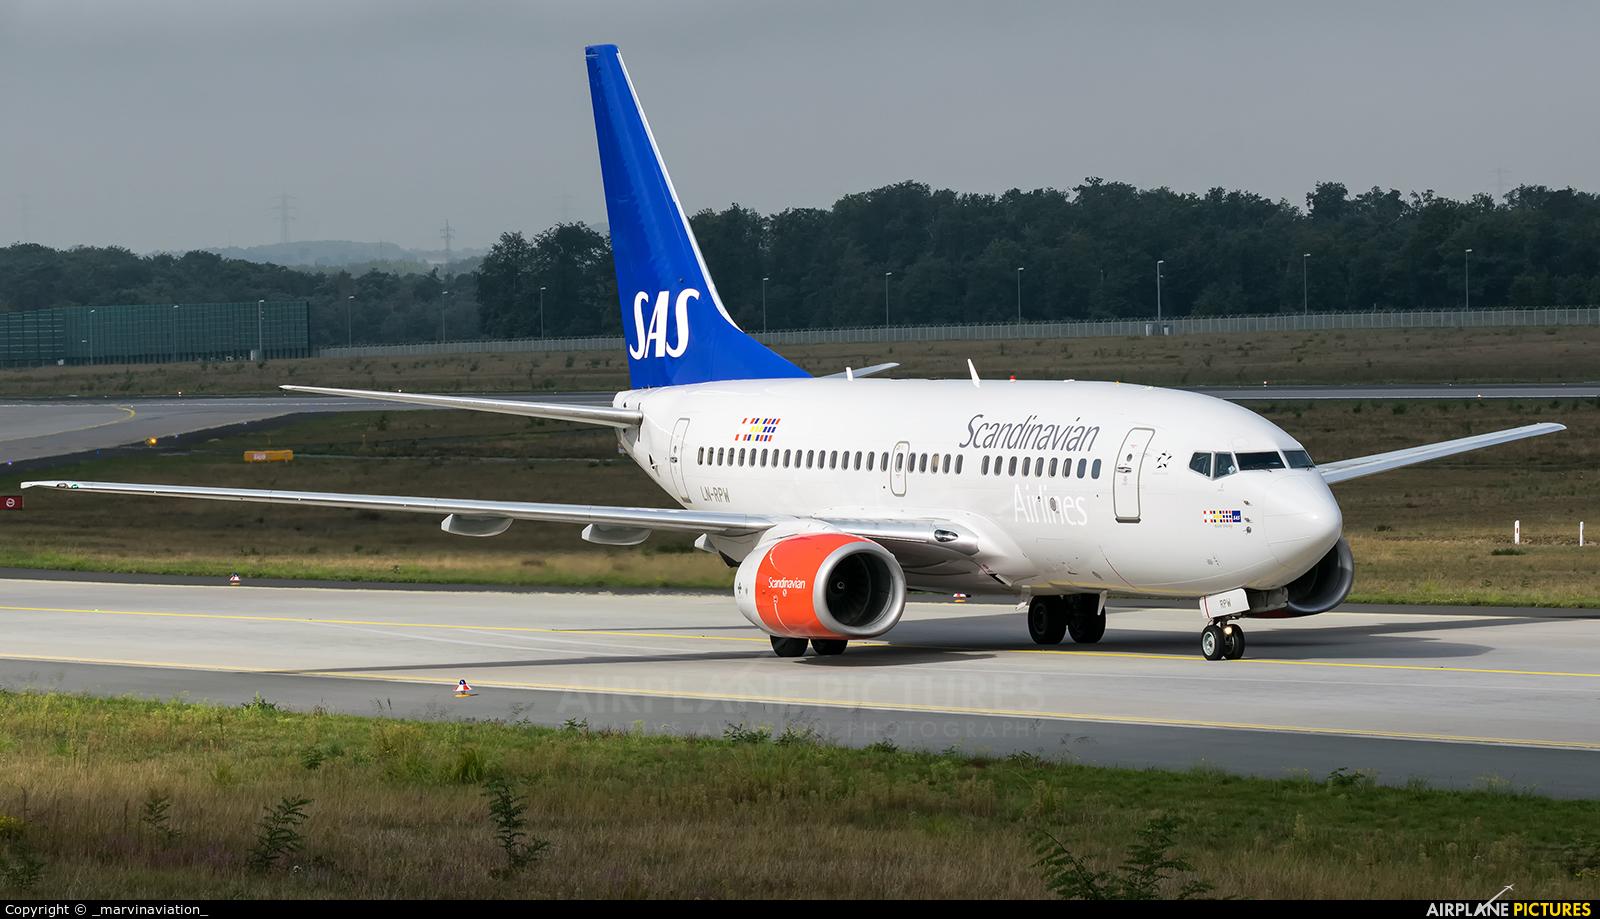 SAS - Scandinavian Airlines LN-RPW aircraft at Frankfurt